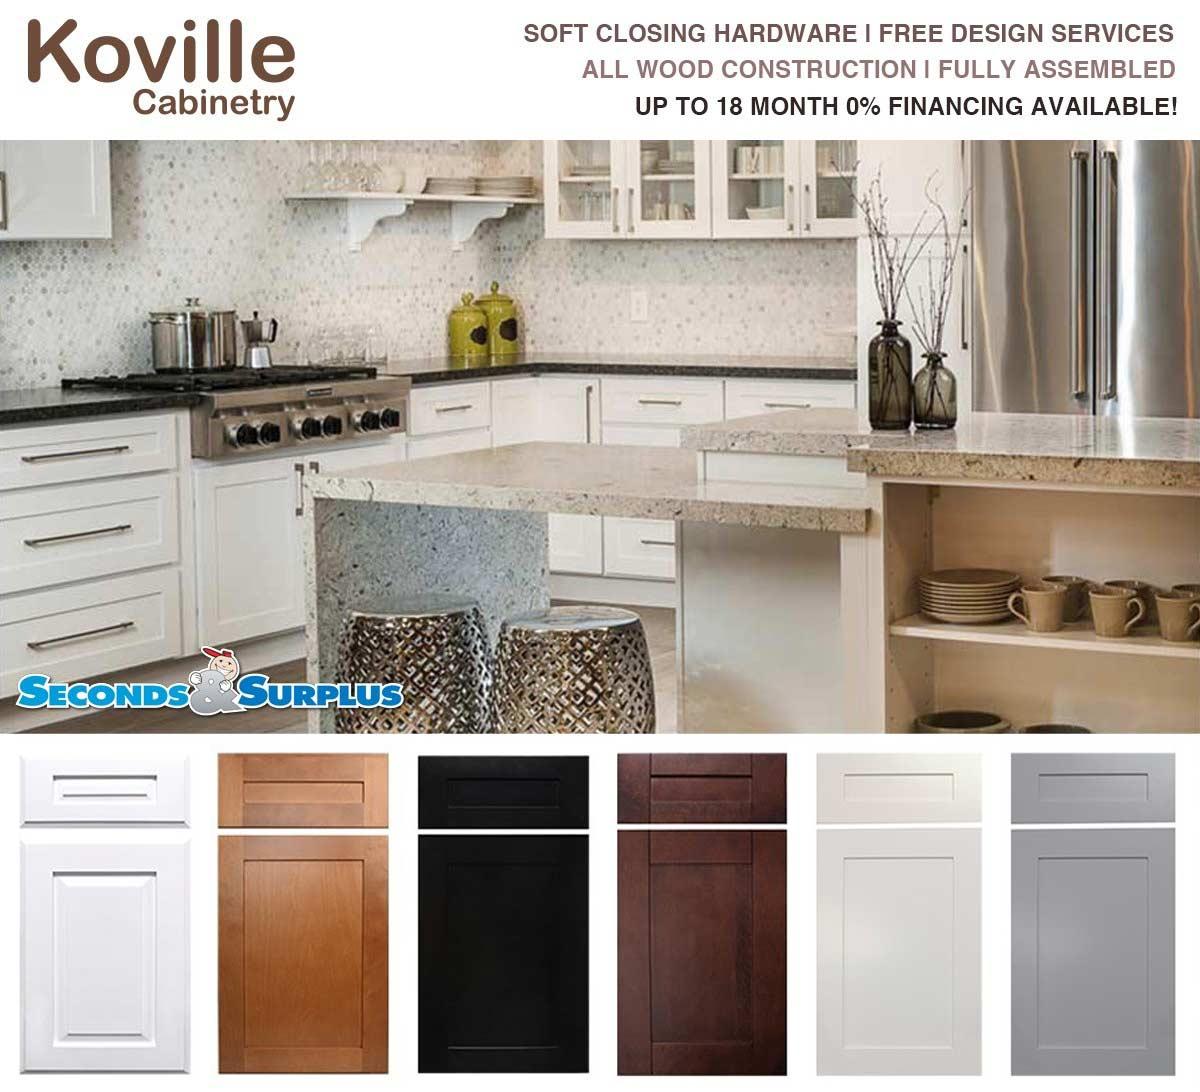 Koville Cabinets